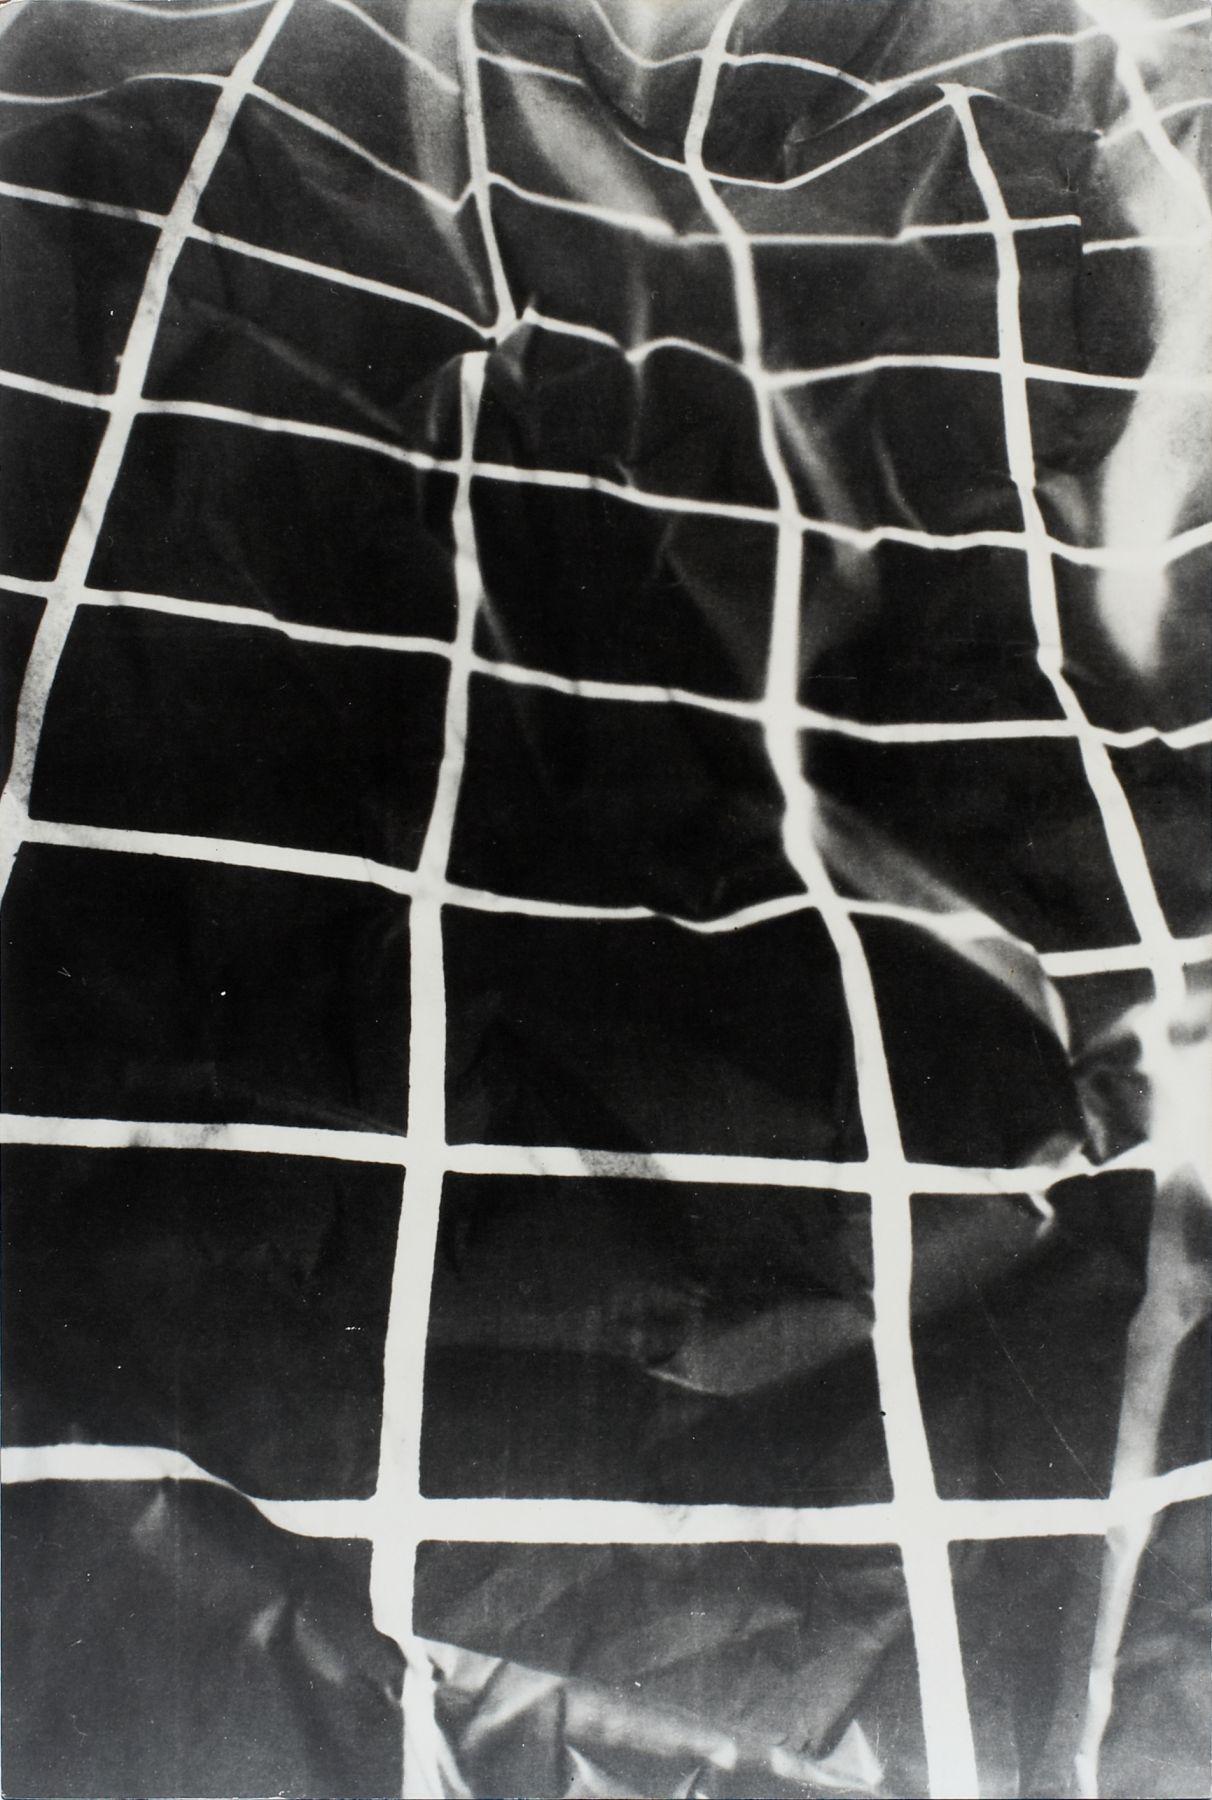 Mel Bochner,Surface De/Formation, 1967.